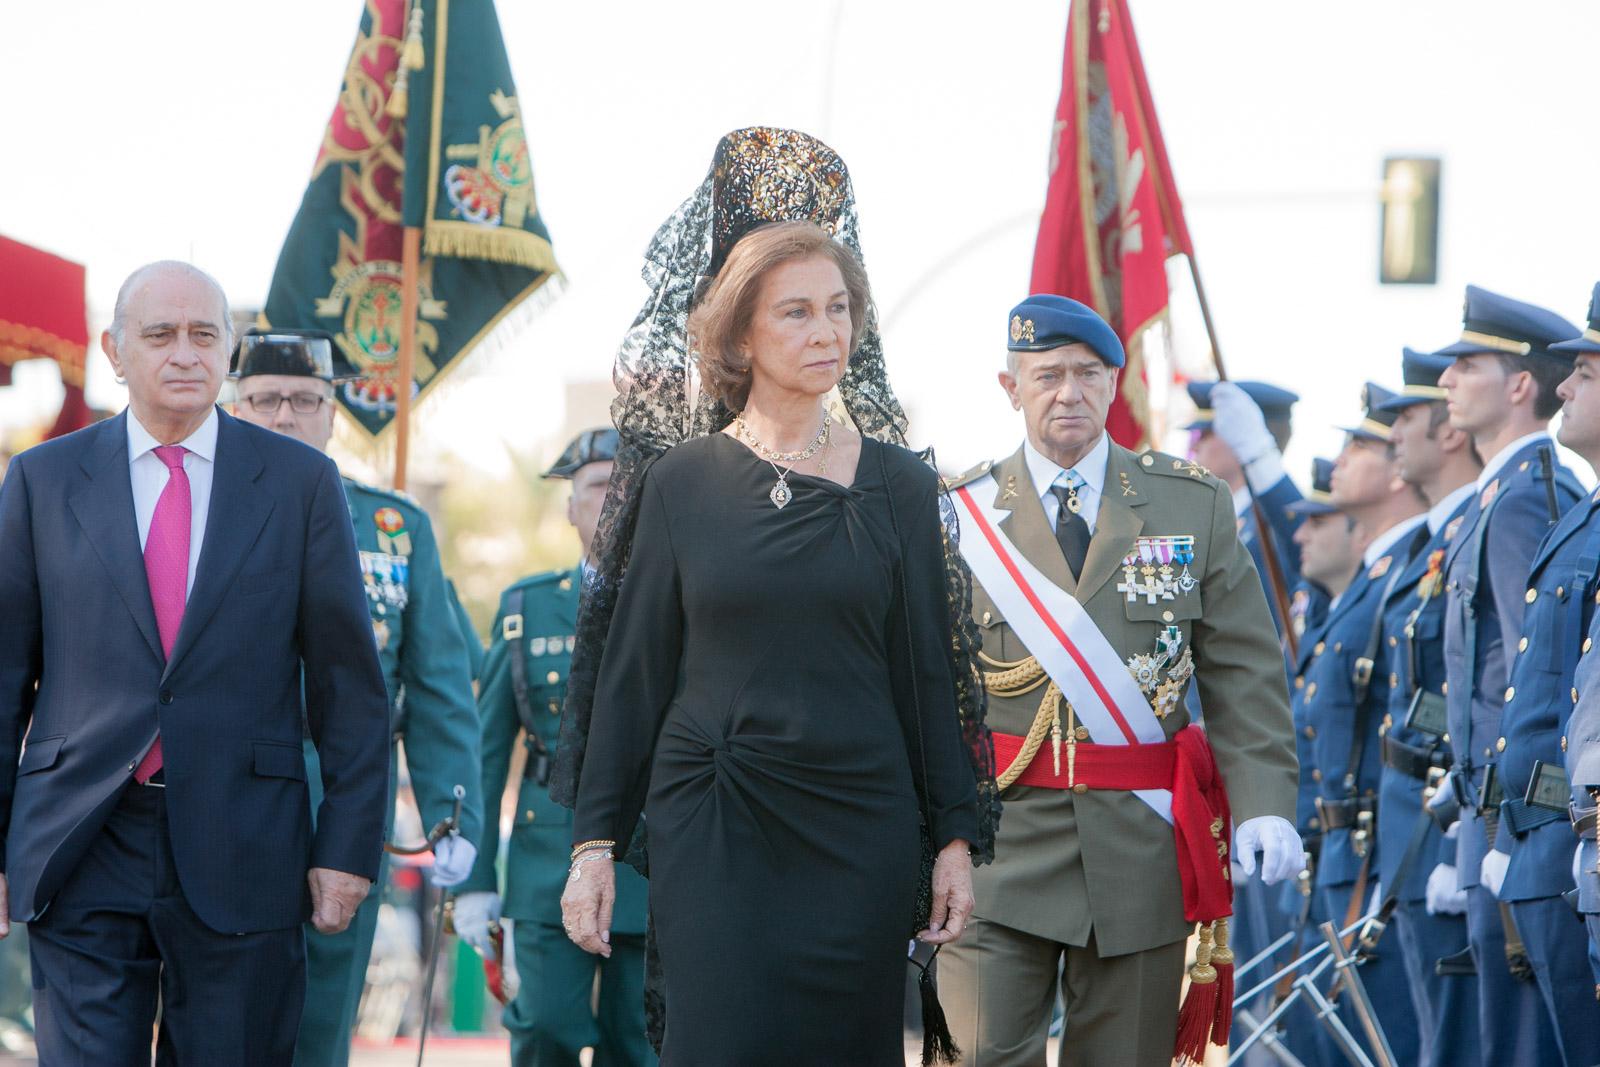 Badajoz, Casa Real, Dia del pilar, La reina doña sofia, presde los actos de celebracion del dia del pilar, patrona de la guardia civil